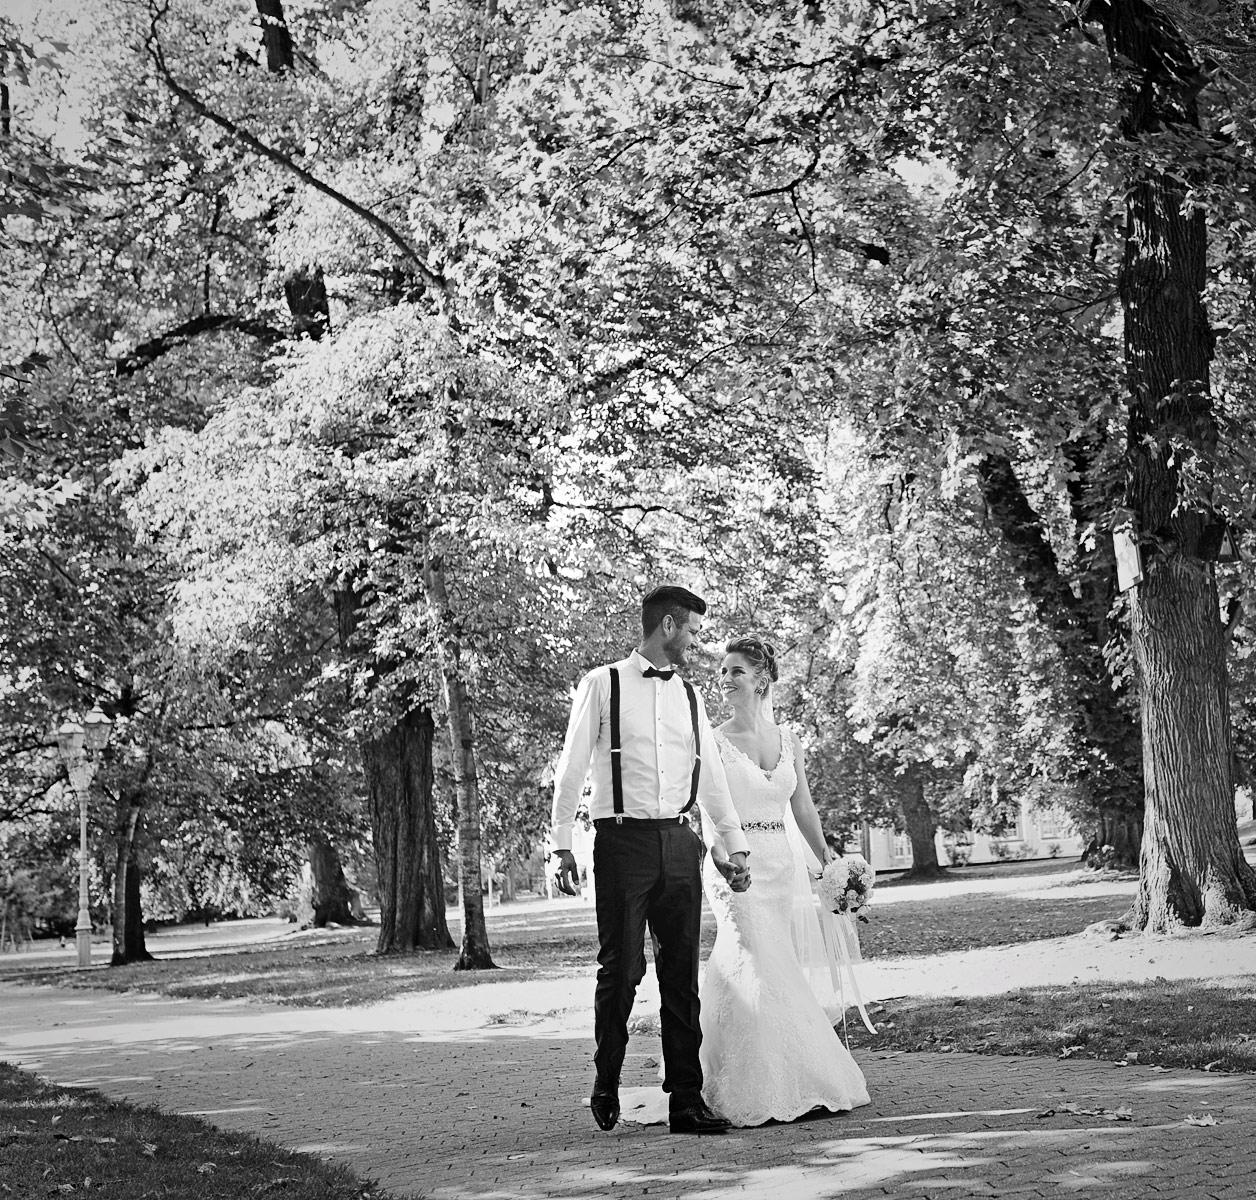 Hochzeitsfotos_Bad_Ems_Nicole_Bouillon_Fotografie9